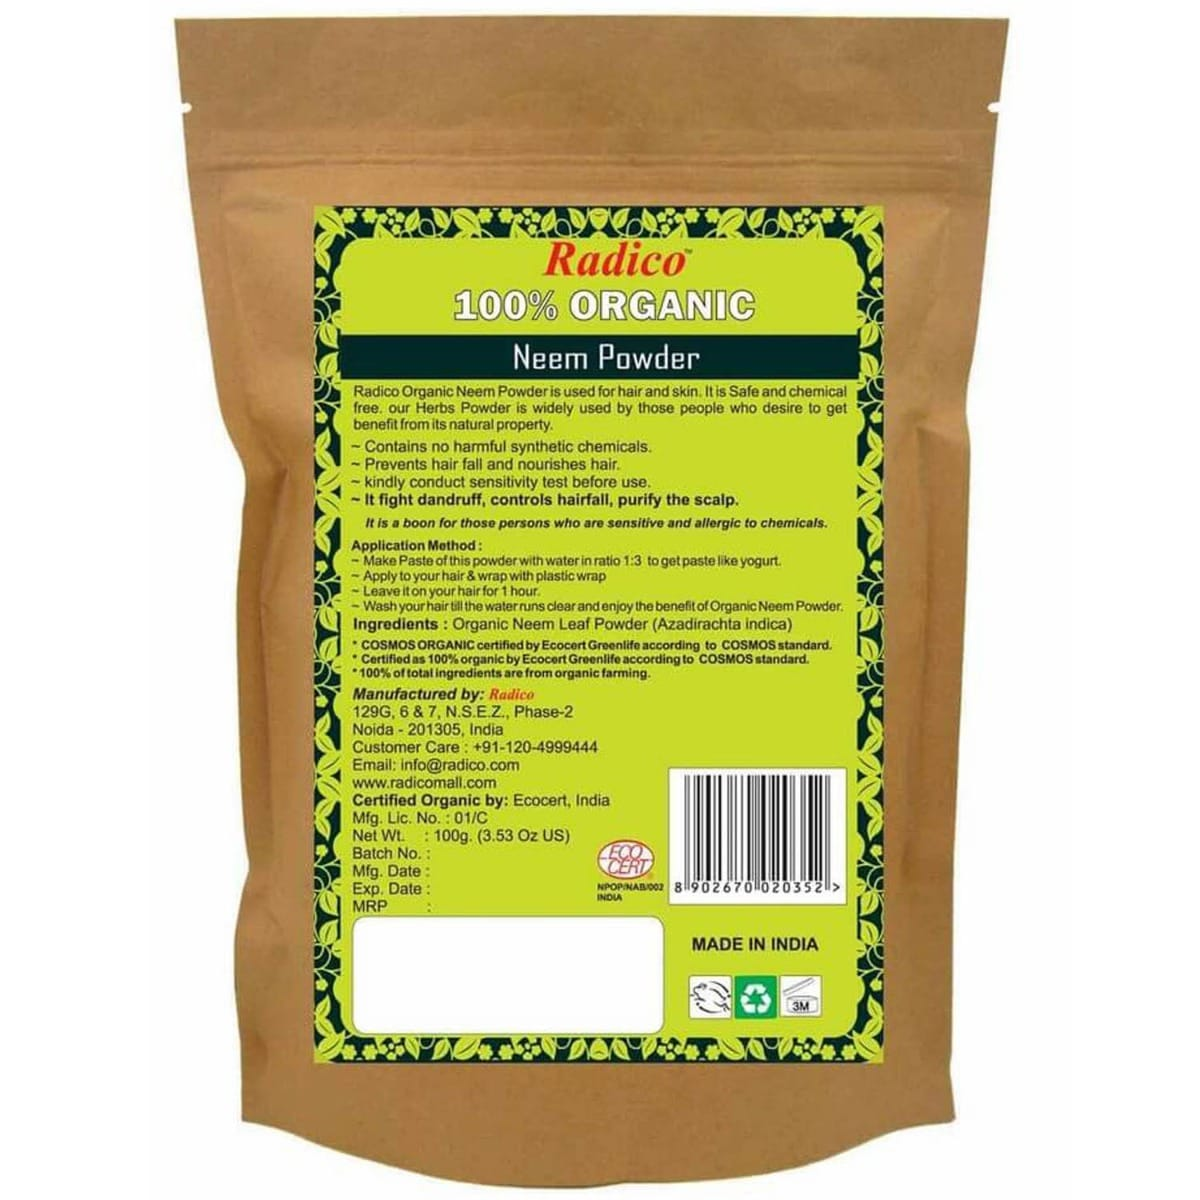 Radico Organic Neem Powder, 100 gm, Pack of 1